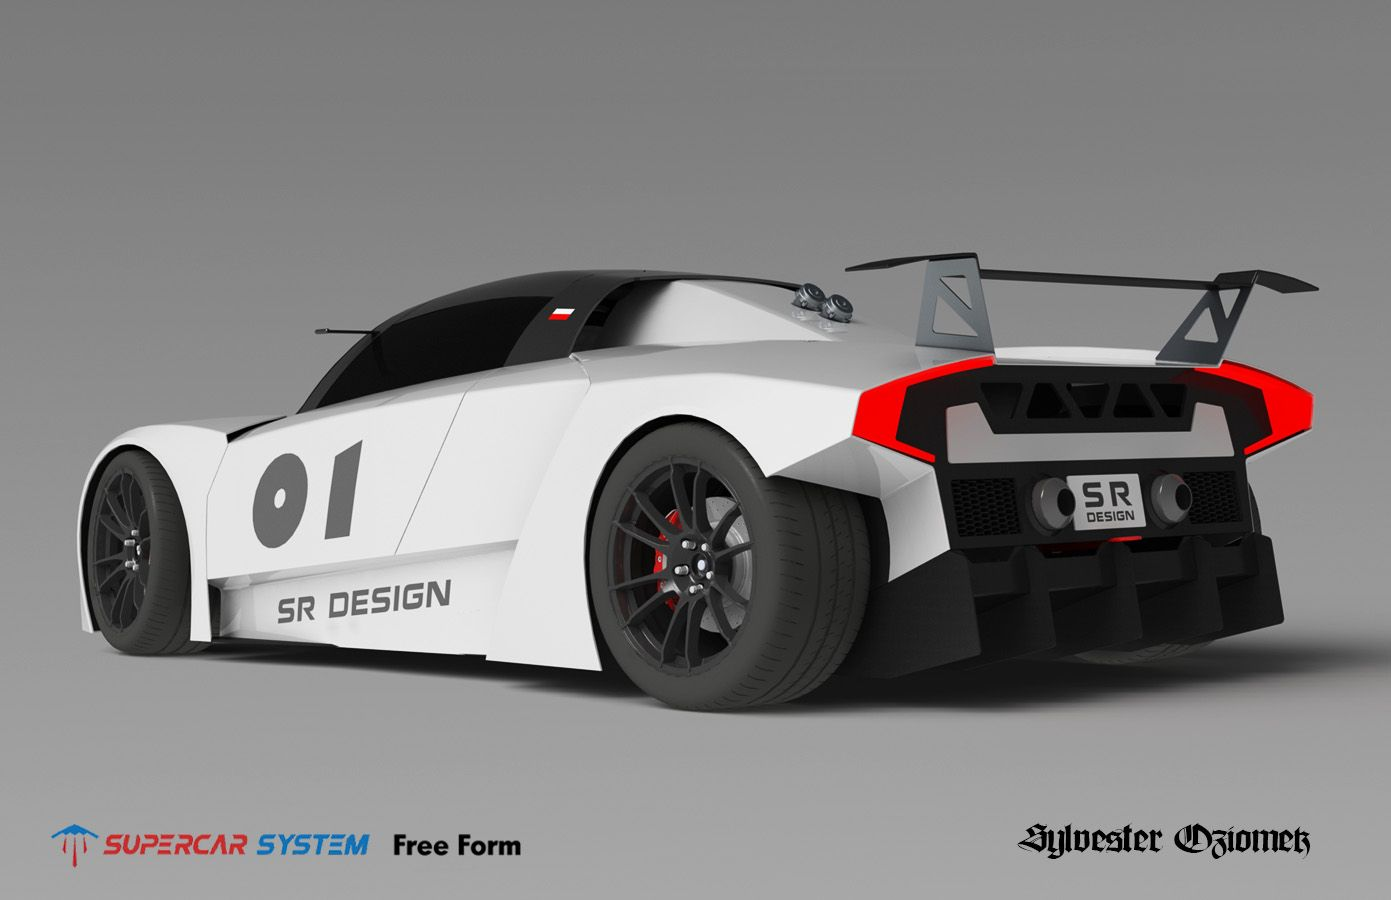 Agresor Supercar Supercar System Body Design Challenge Super Cars Design Challenges System